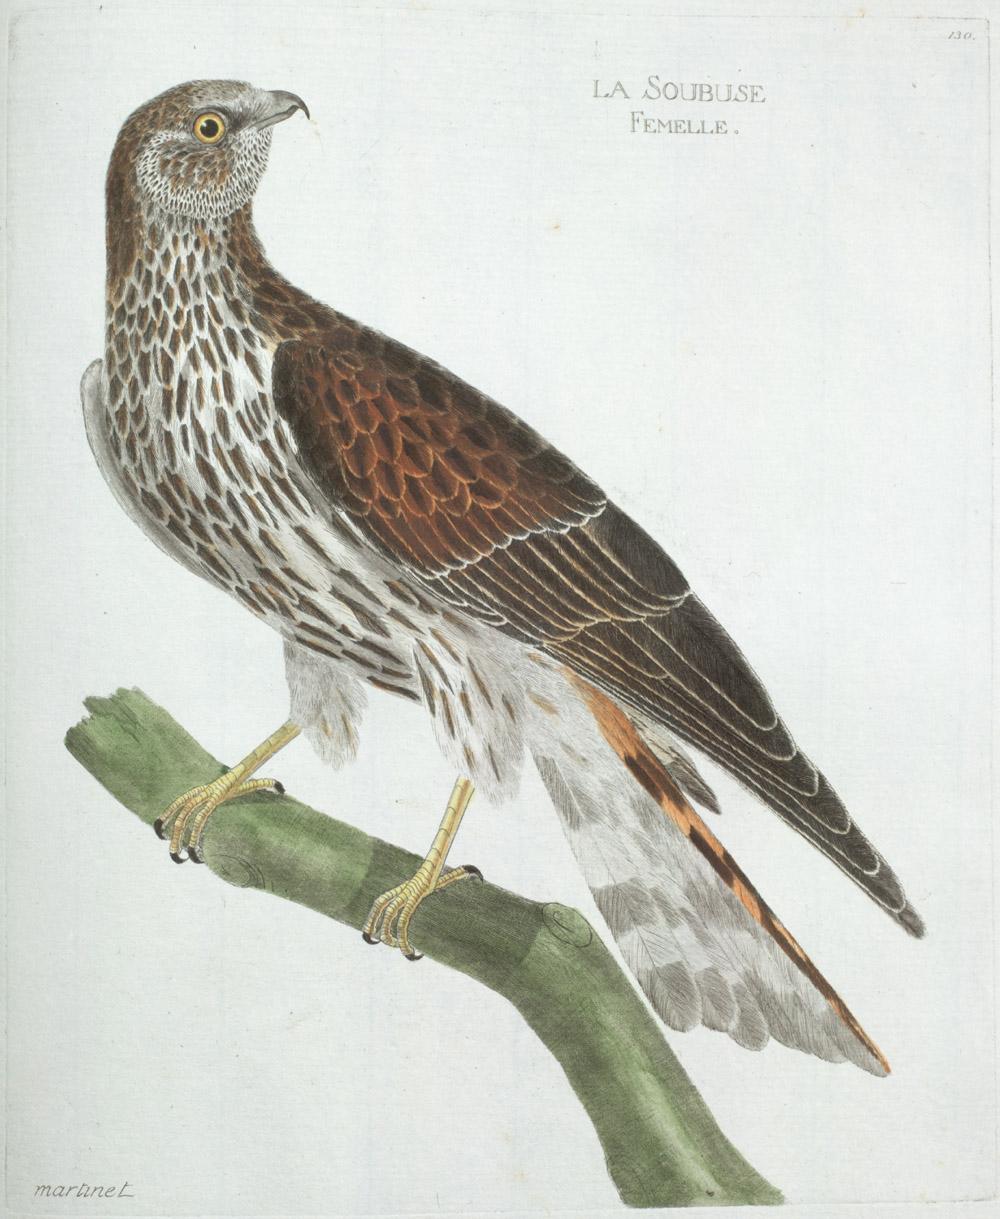 Plate 130: La Soulouse Femelle,  Image number:SIL13-1-265b